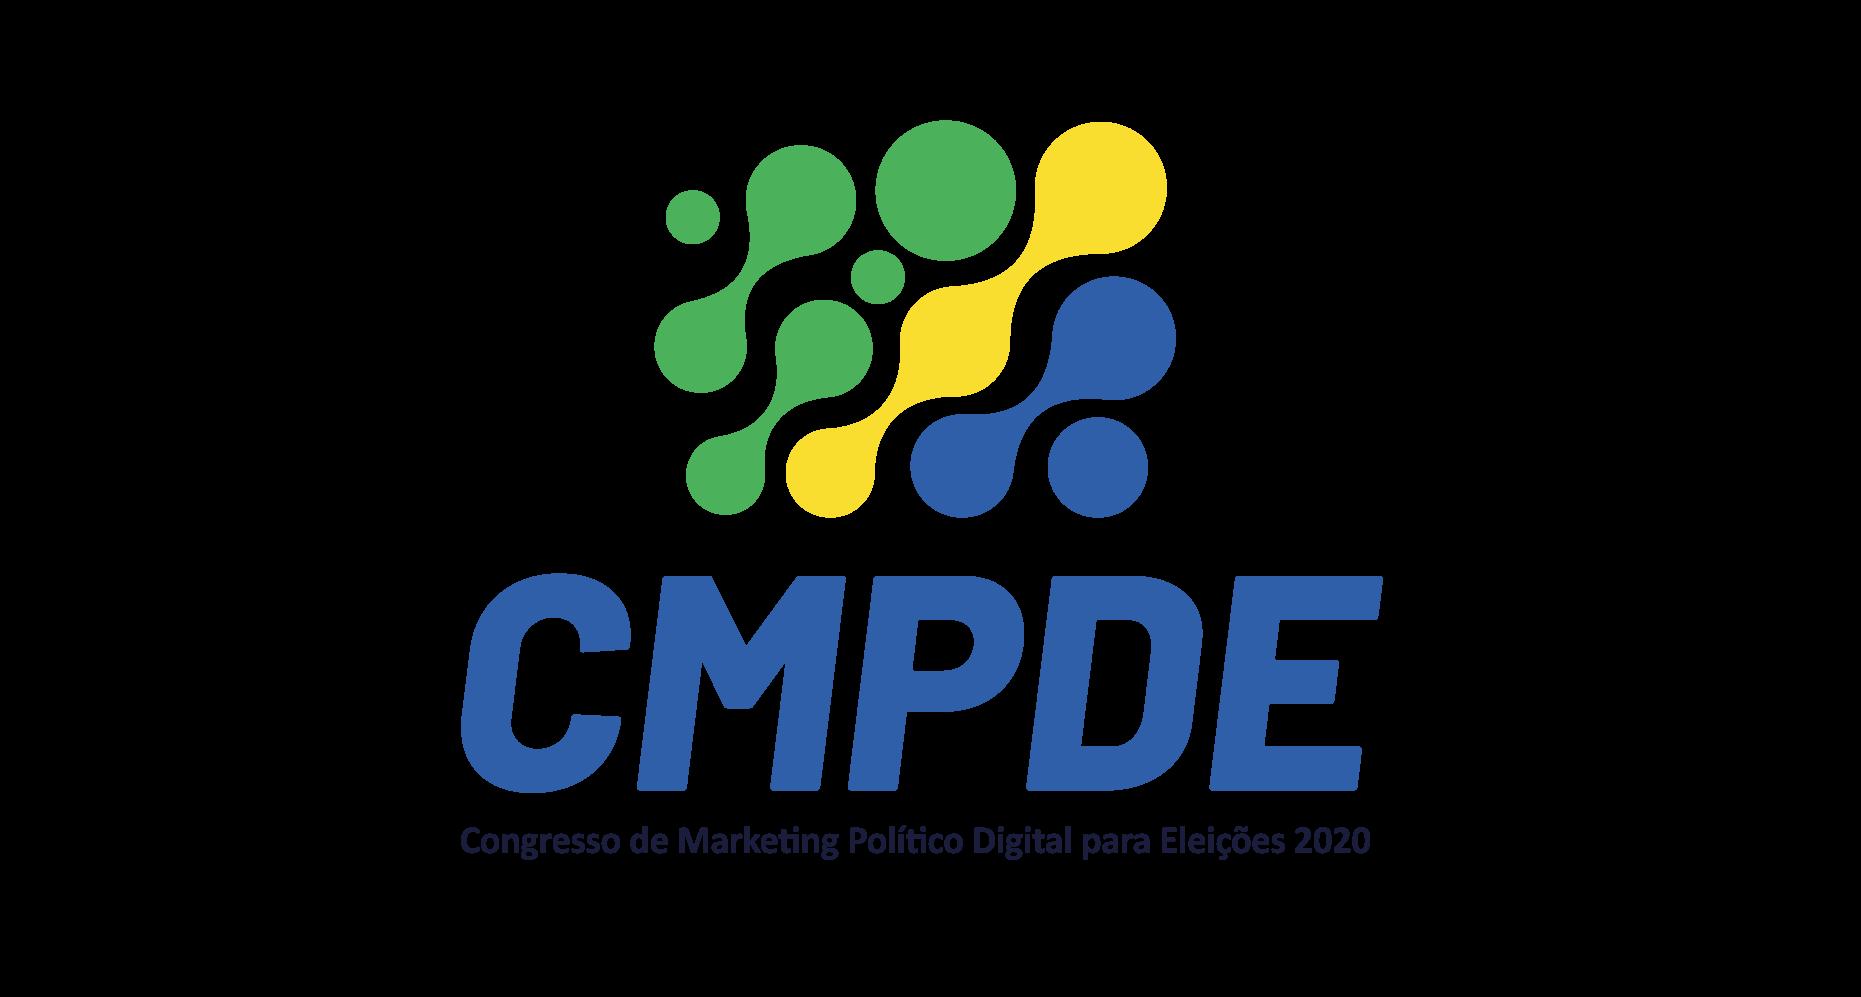 CMPDE